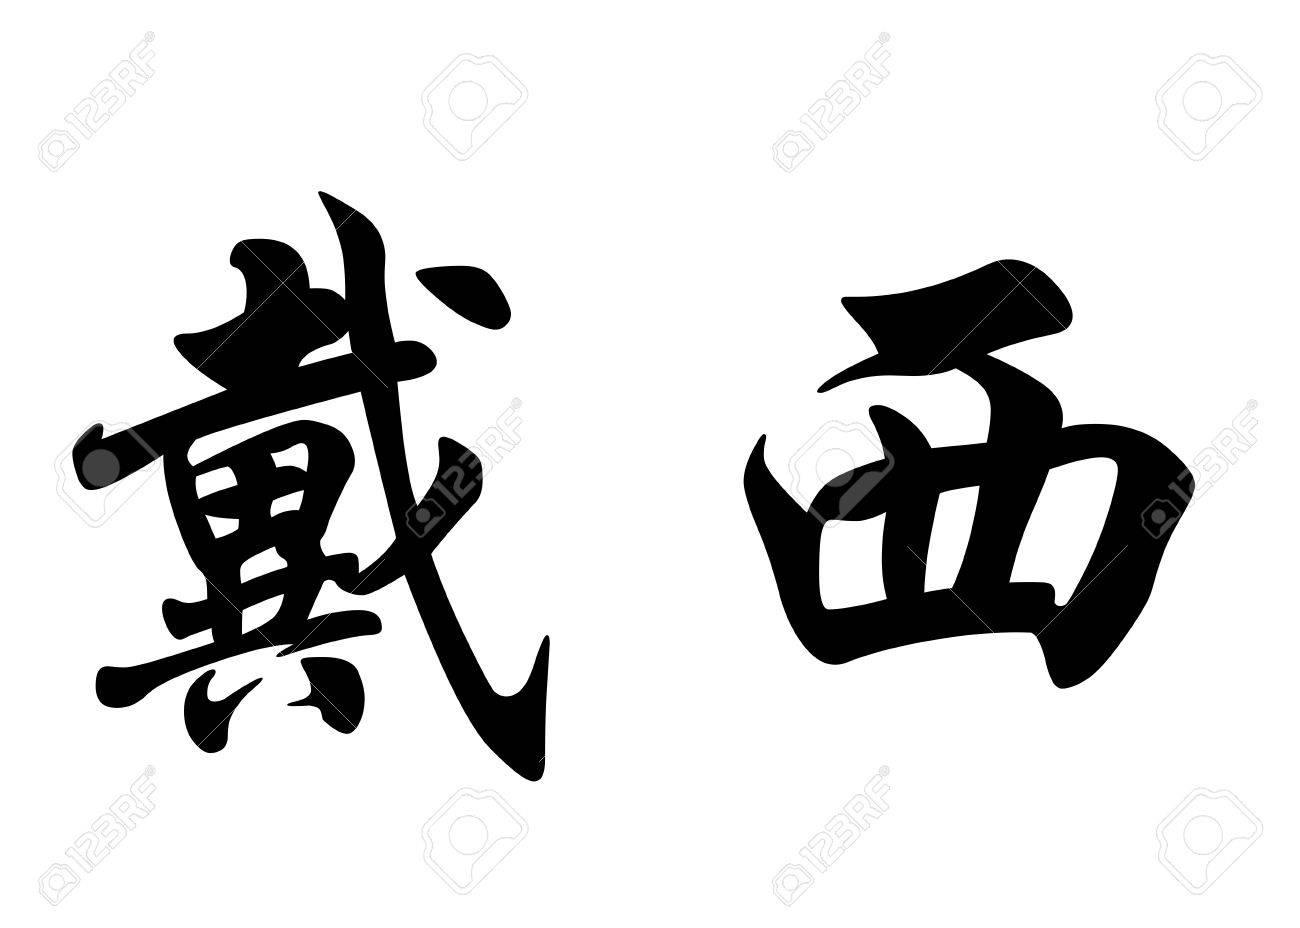 English name daisy in chinese kanji calligraphy characters or english name daisy in chinese kanji calligraphy characters or japanese characters stock photo 37897497 biocorpaavc Choice Image